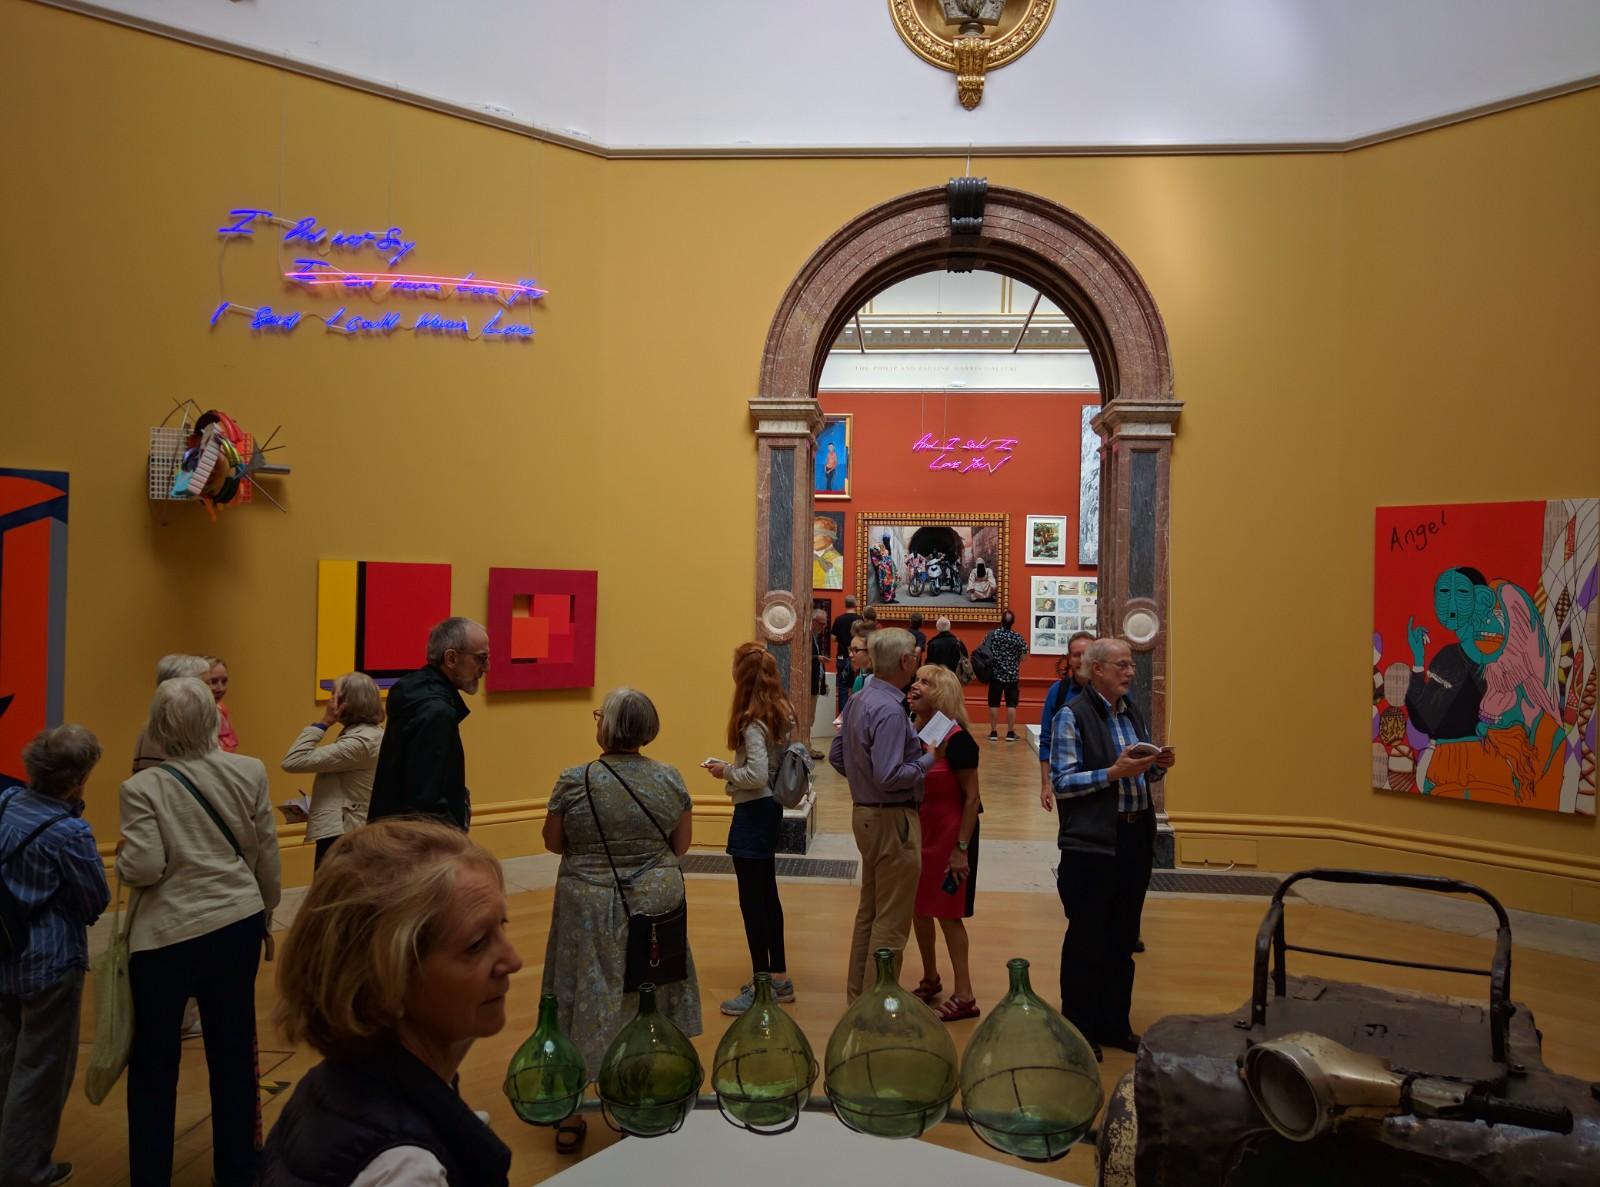 Summer Exhibition 2017, 13 June - 20 August 2017, Royal Academy of Arts, Burlington House, London